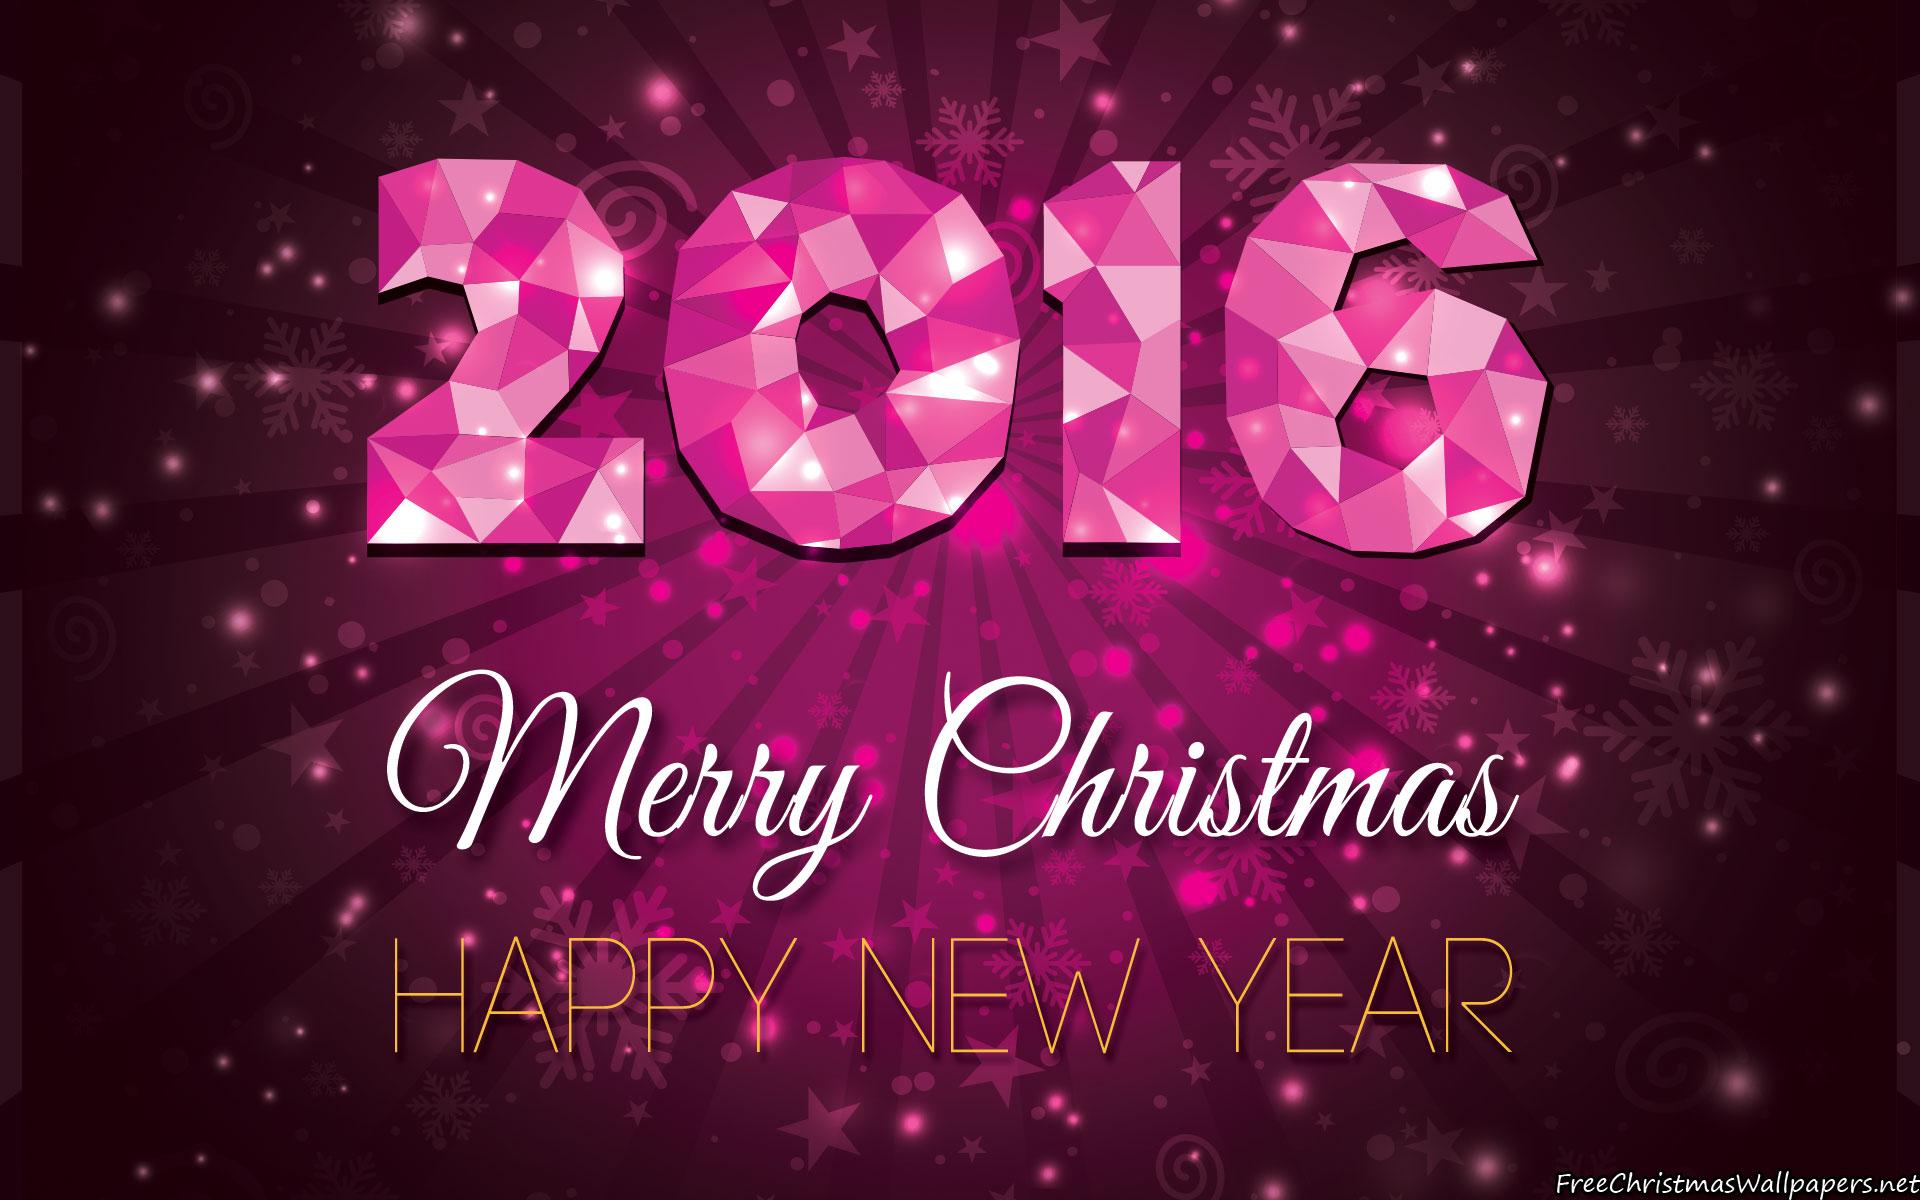 Merry Christmas! Happy Birthday Jesus! – Christian.Faith.Fashionista